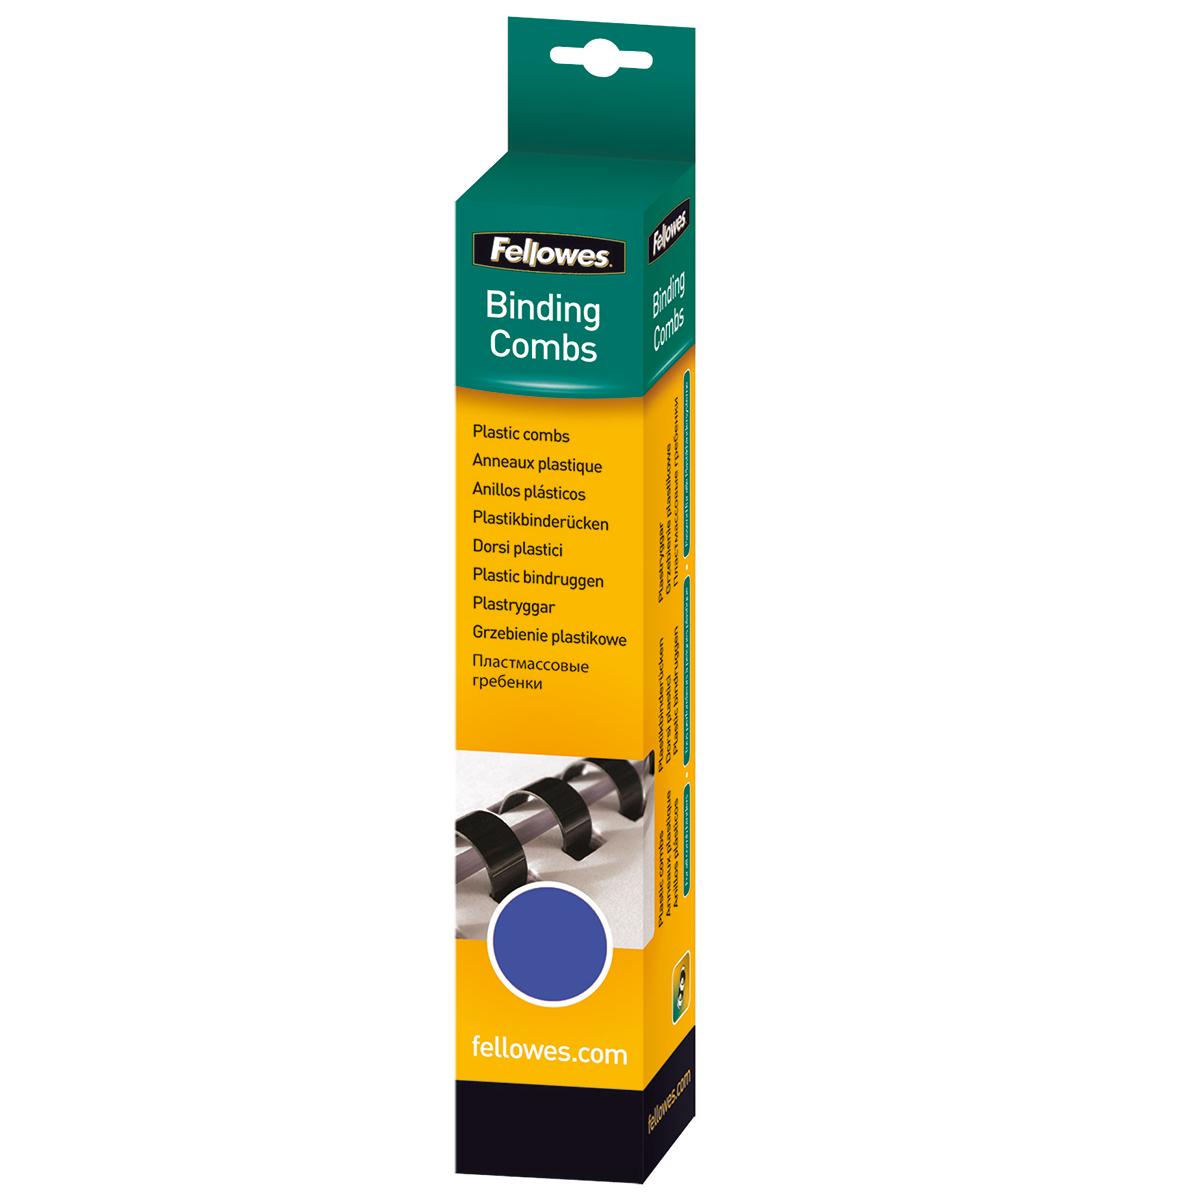 Fellowes 53309 10mm Blue Comb 25pk